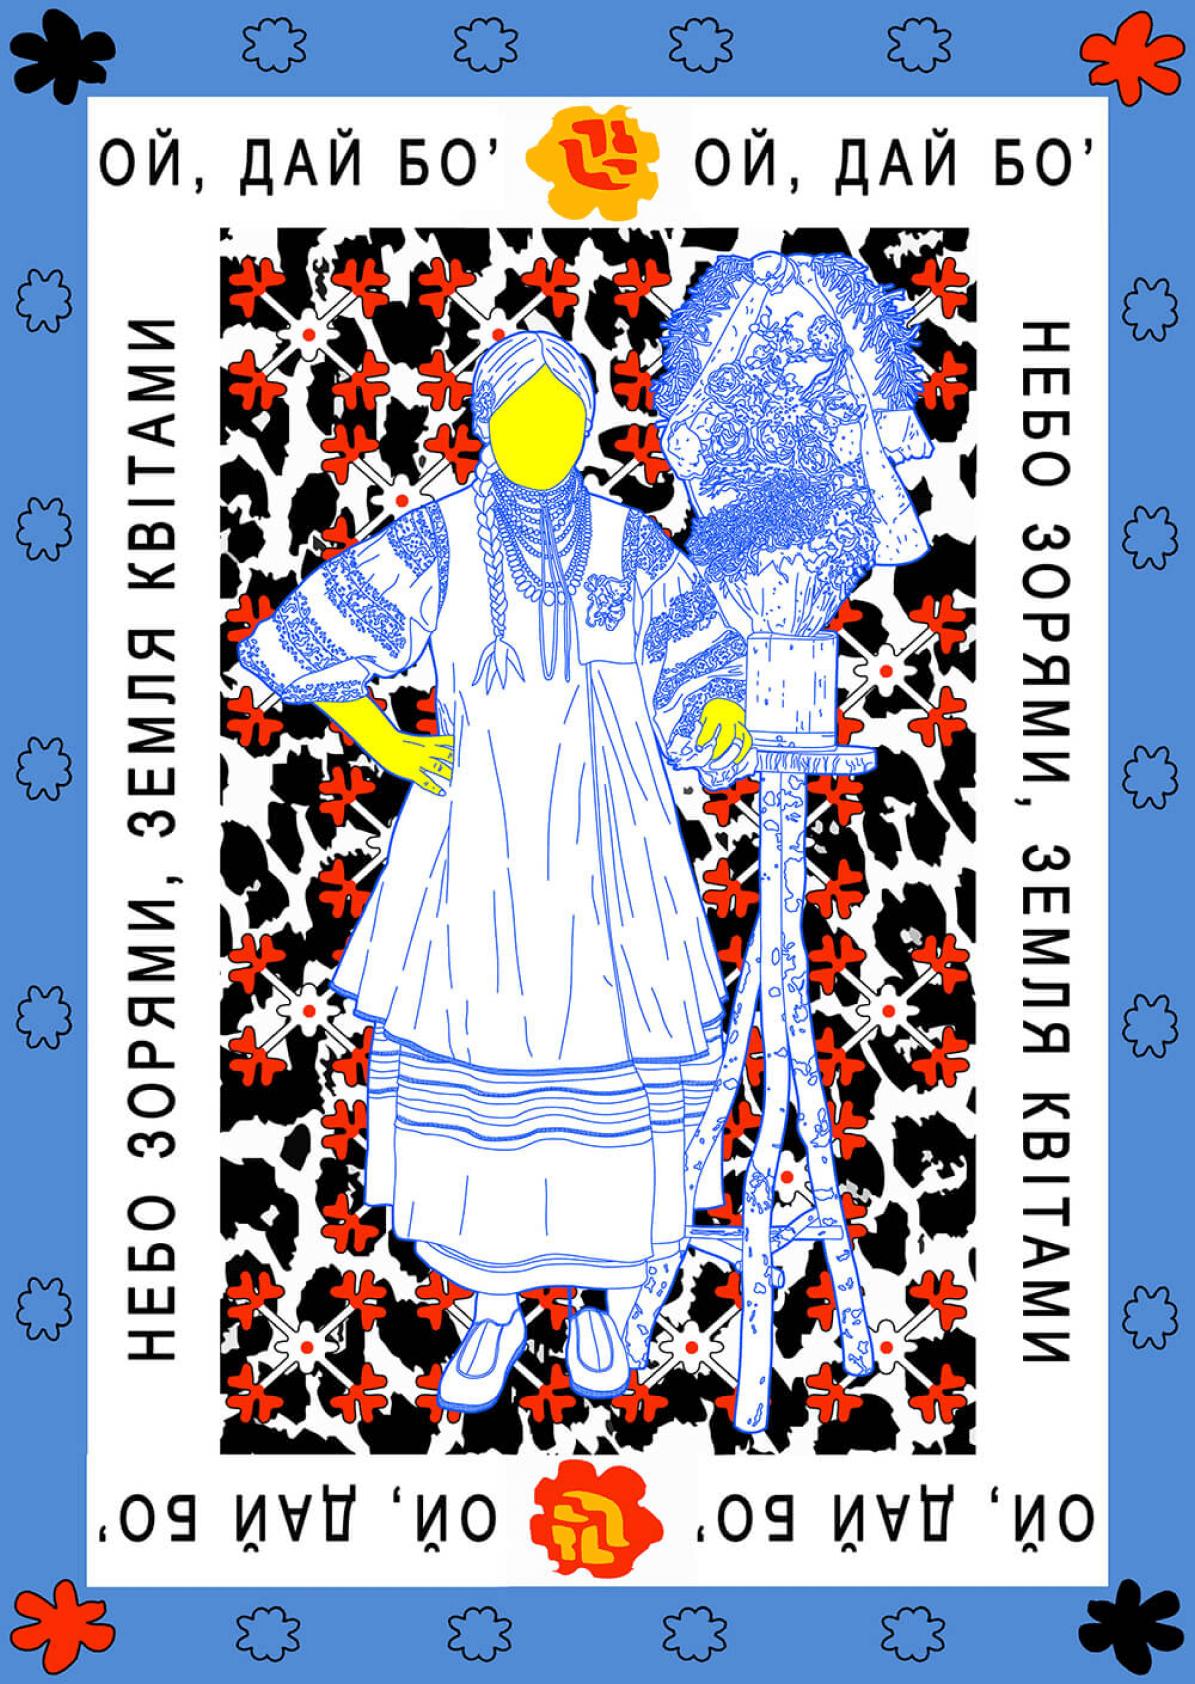 otog studio, poster, A PLEASURE VOYAGE INTO DESIGN EXPERIENCE exhibition at Akademija gallery, Vilnius